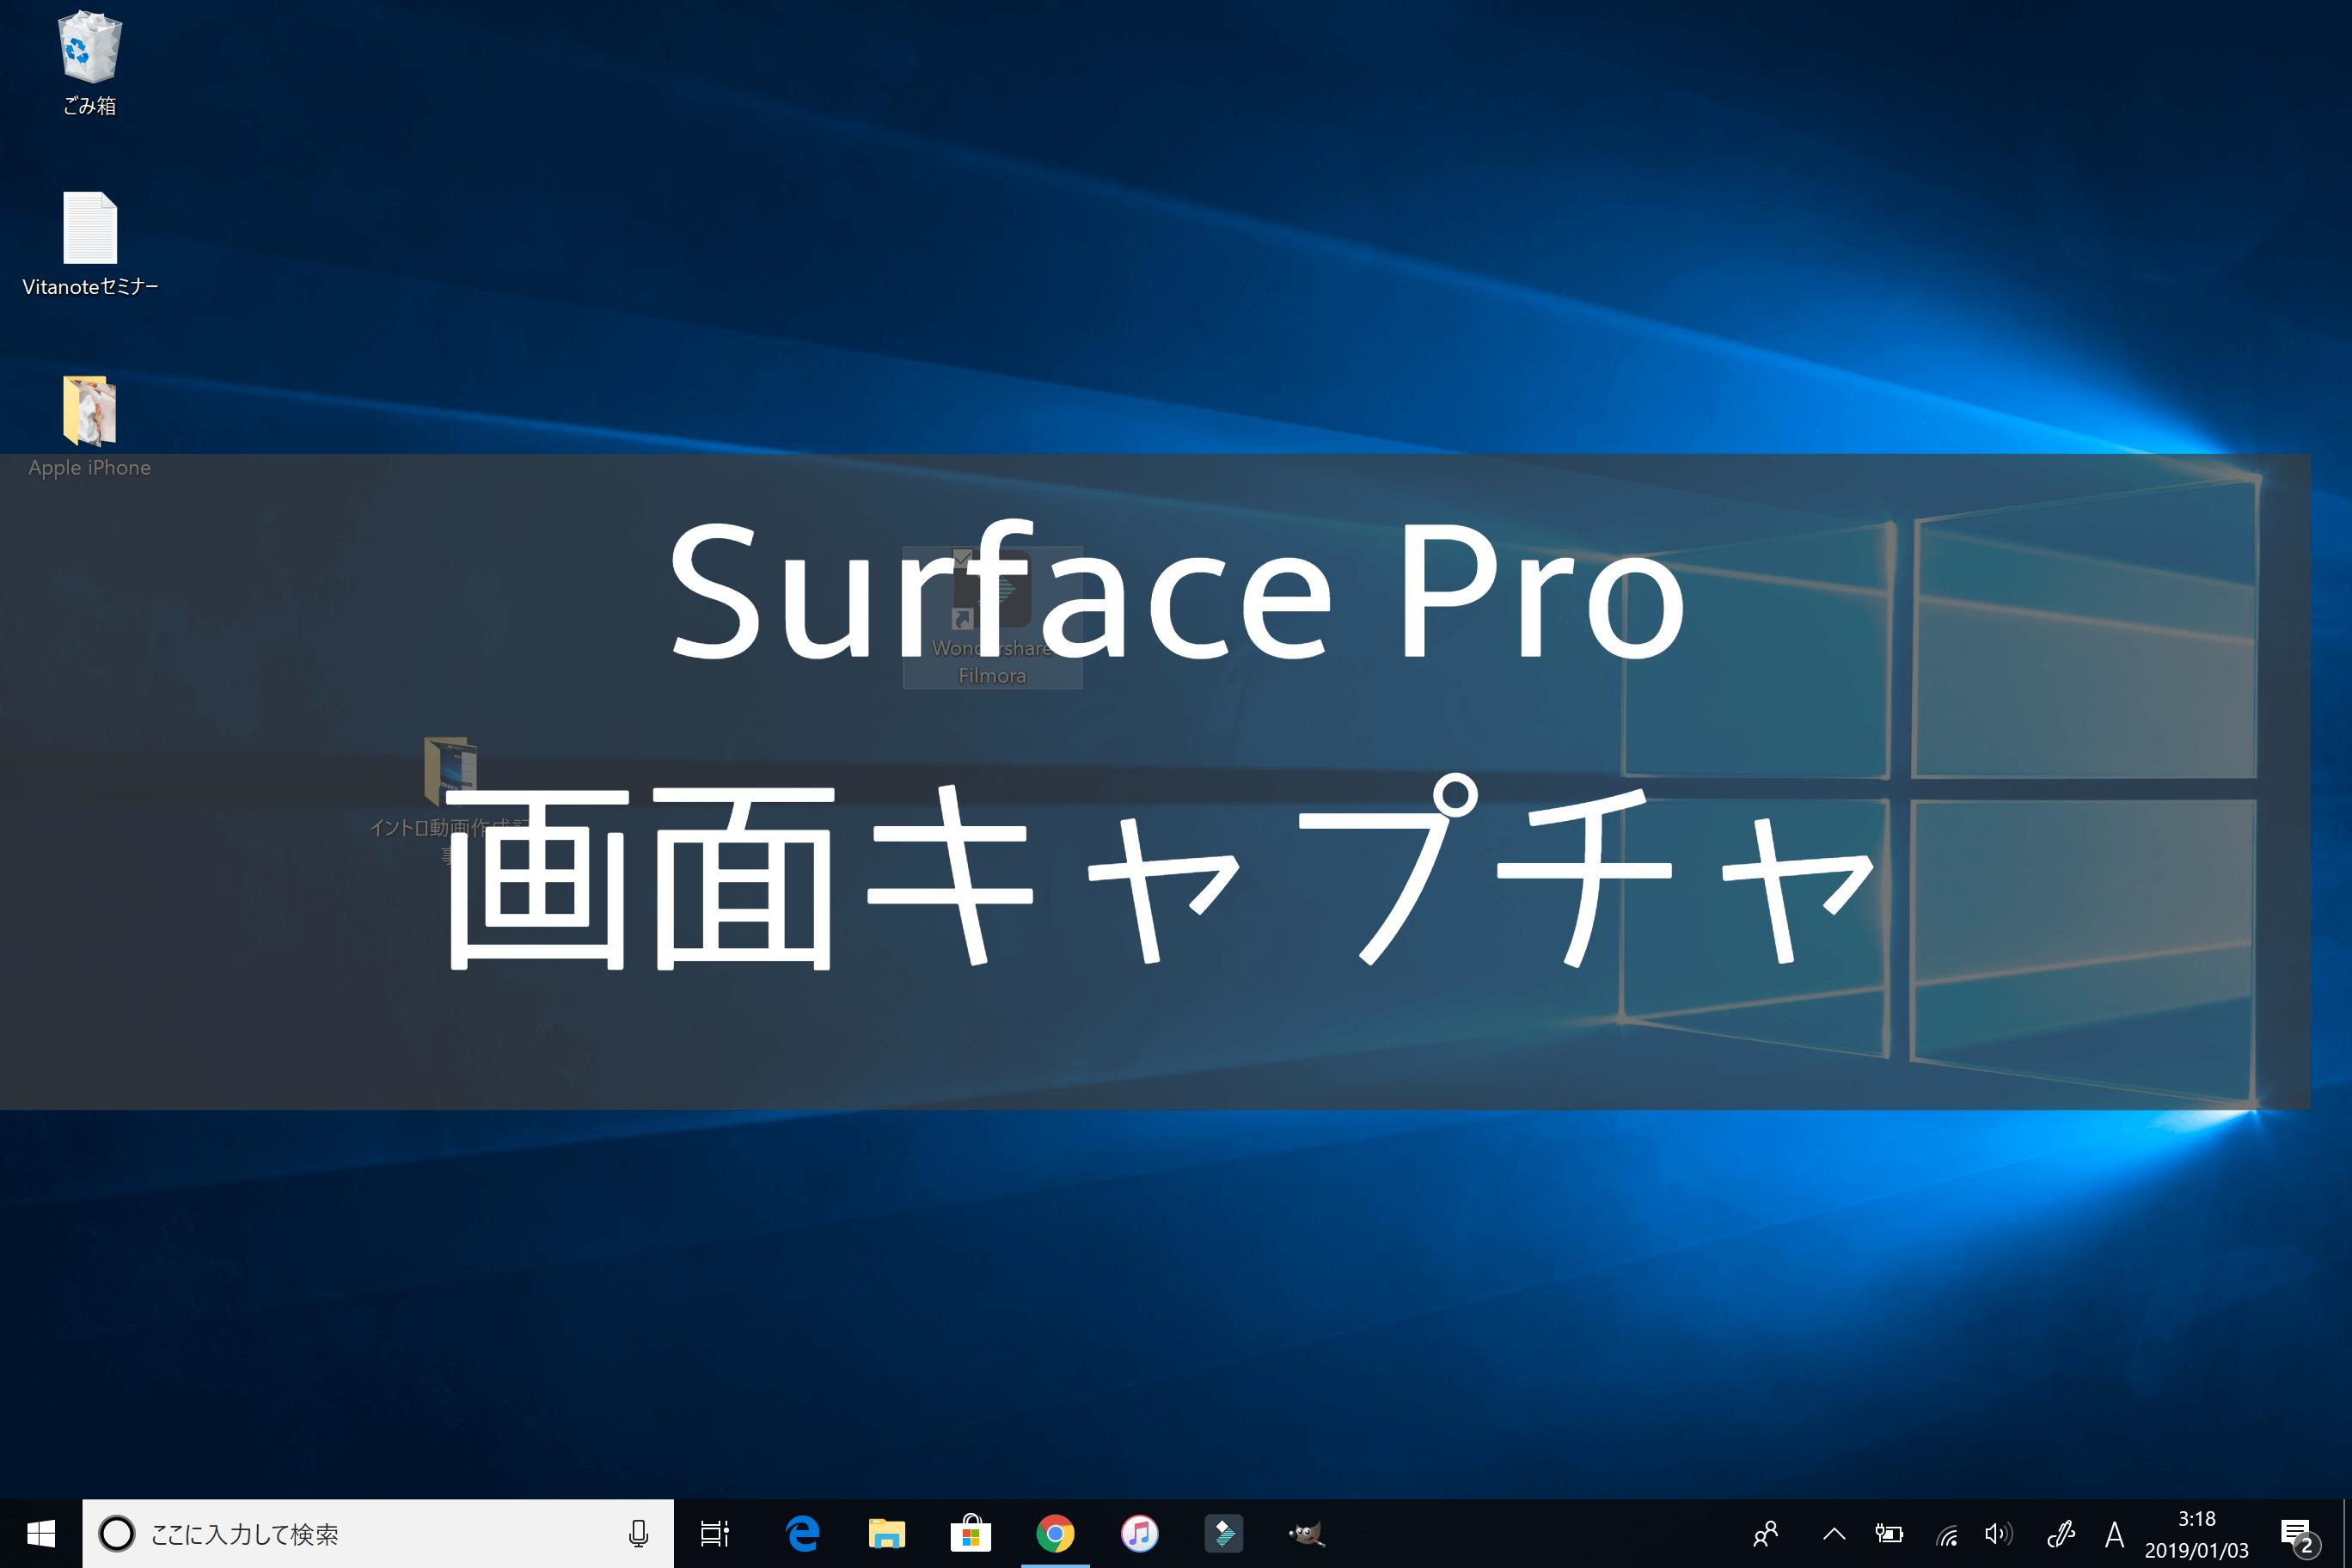 Surfacepro画面キャプチャ